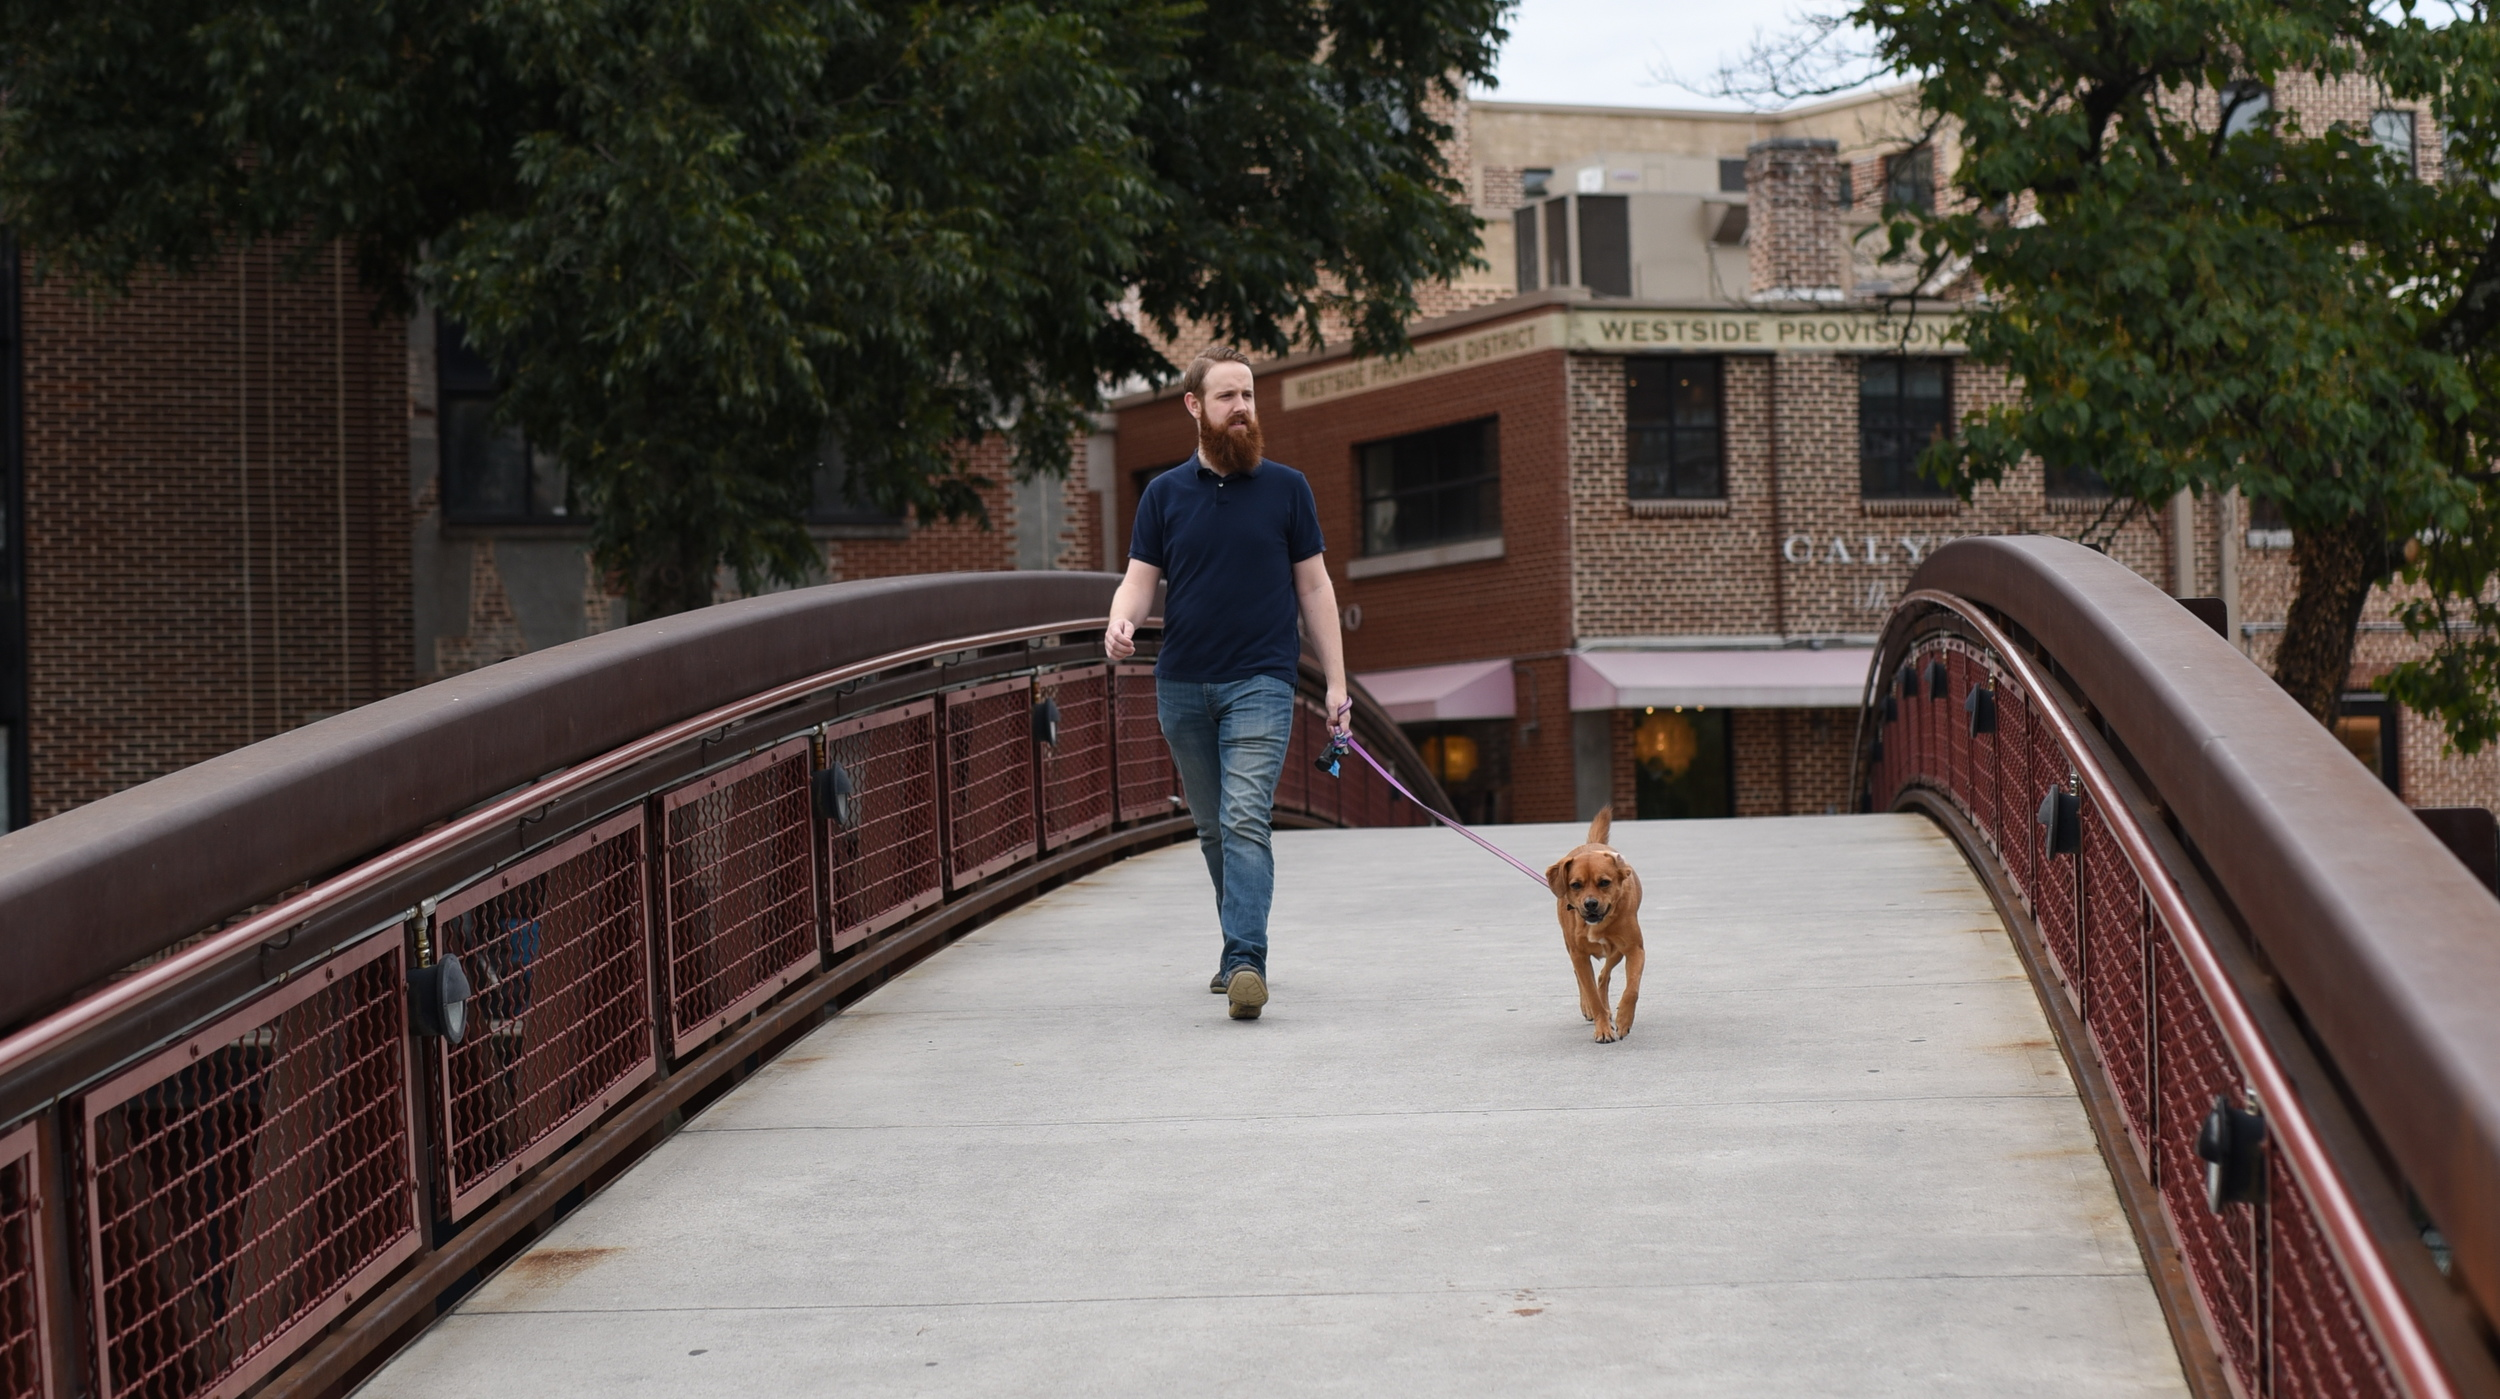 guy-walking-over-bridge.jpg